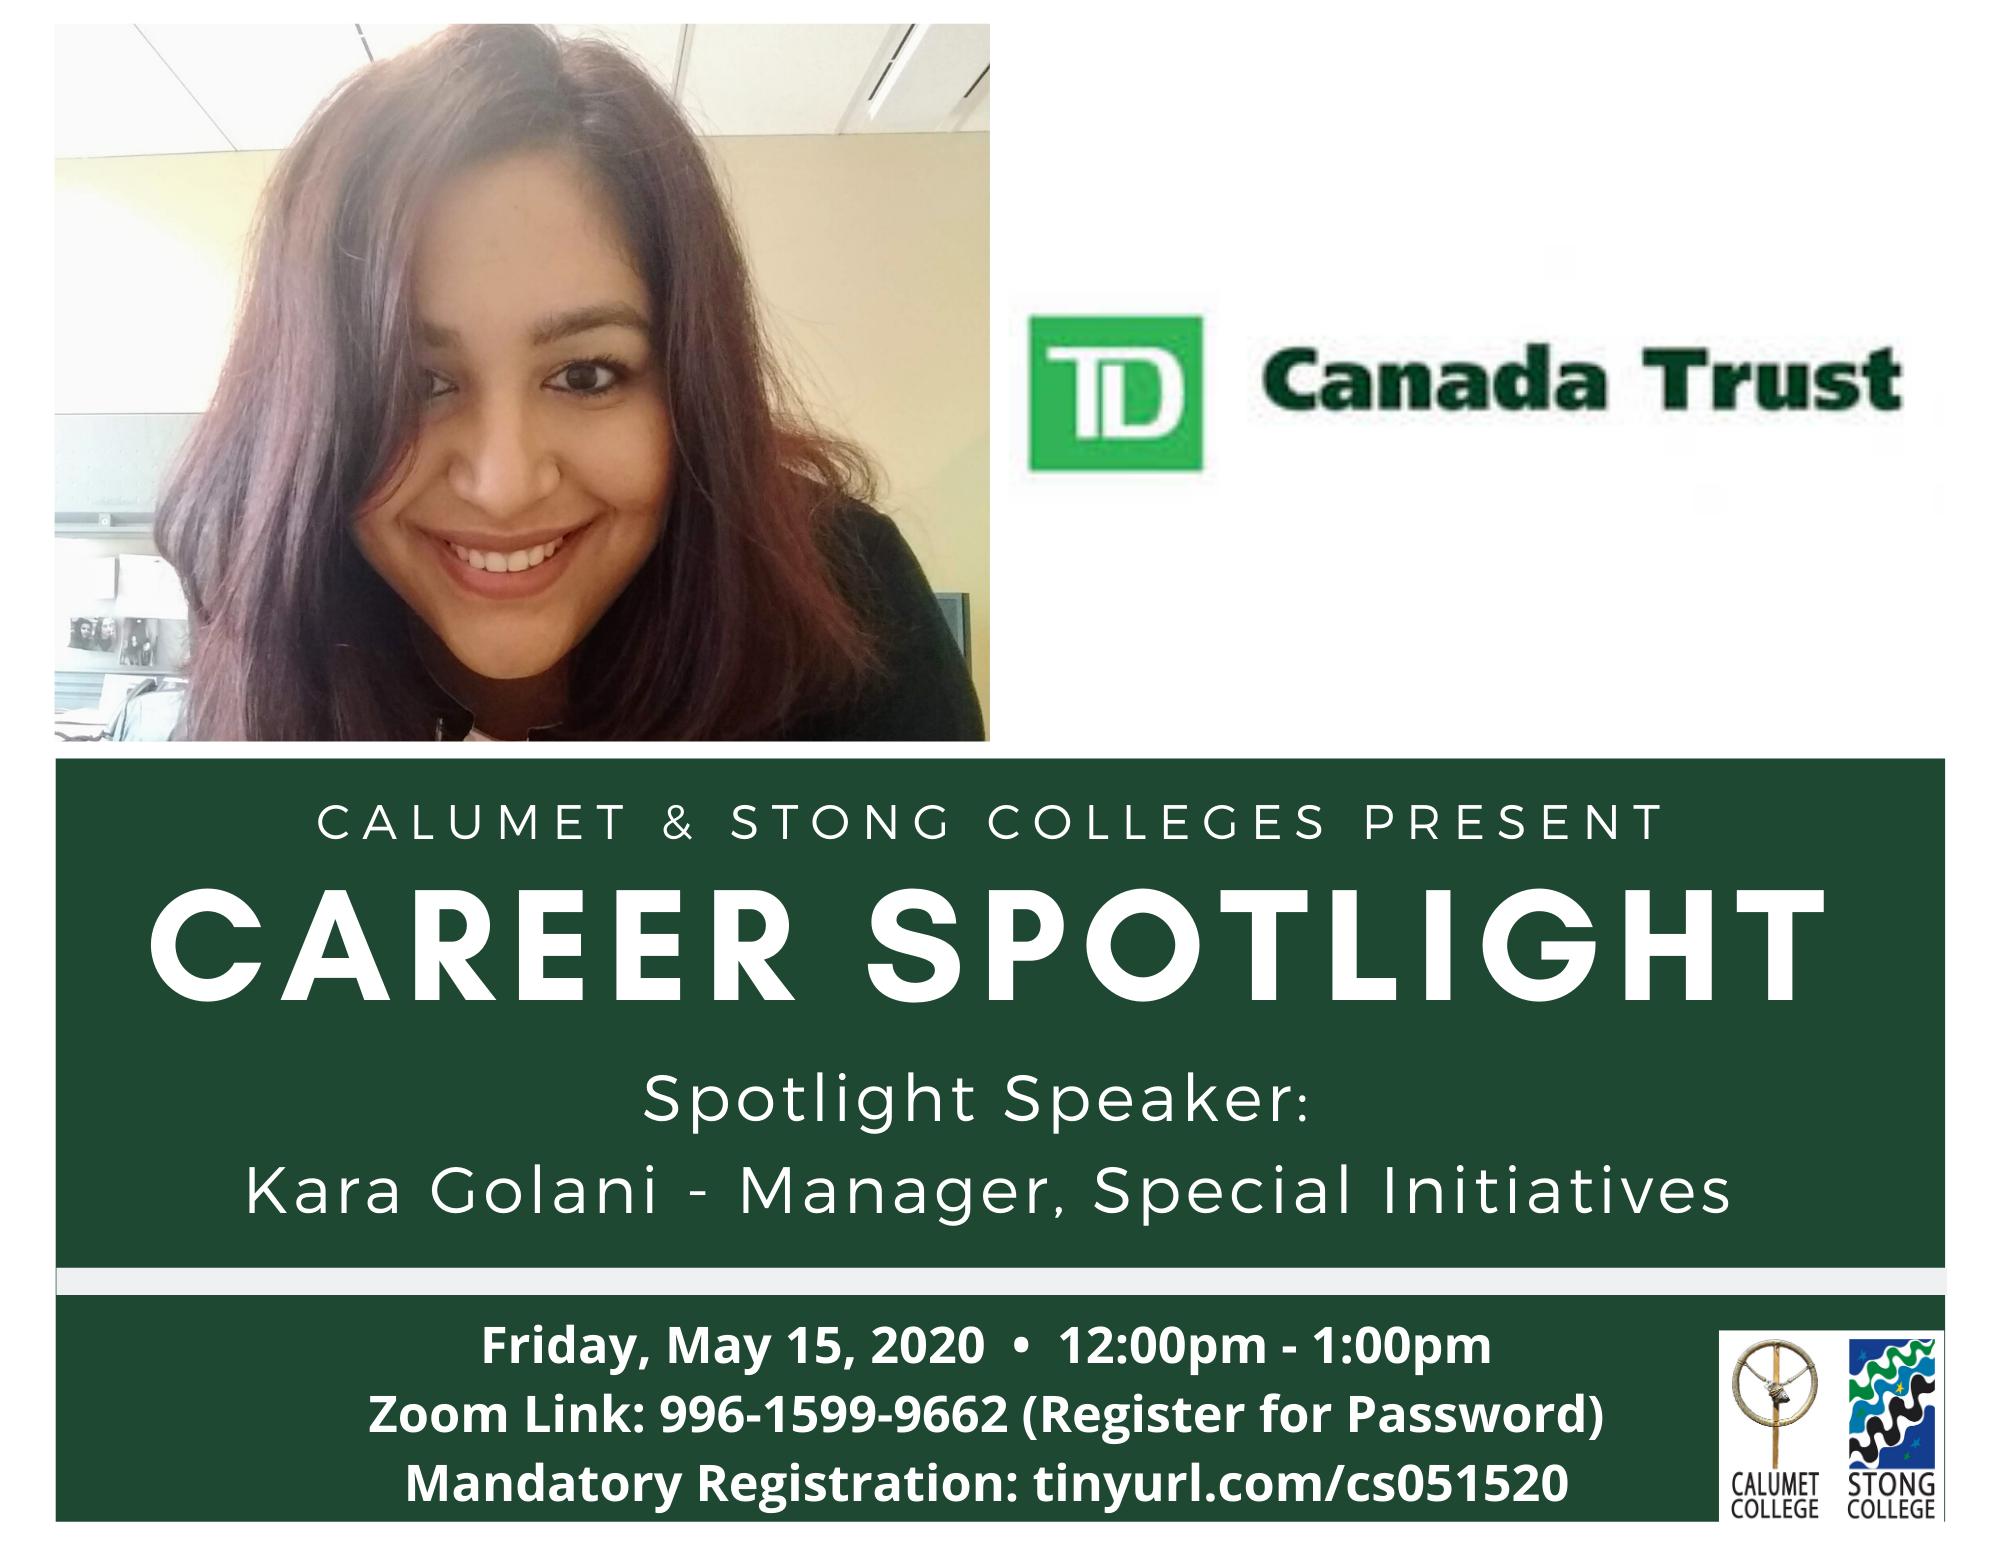 CAREER SPOTLIGHT: KARA GOLANI – MANAGER, SPECIAL INITIATIVES @ TD CANADA TRUST @ Zoom Meeting ID: 996-1599-9662